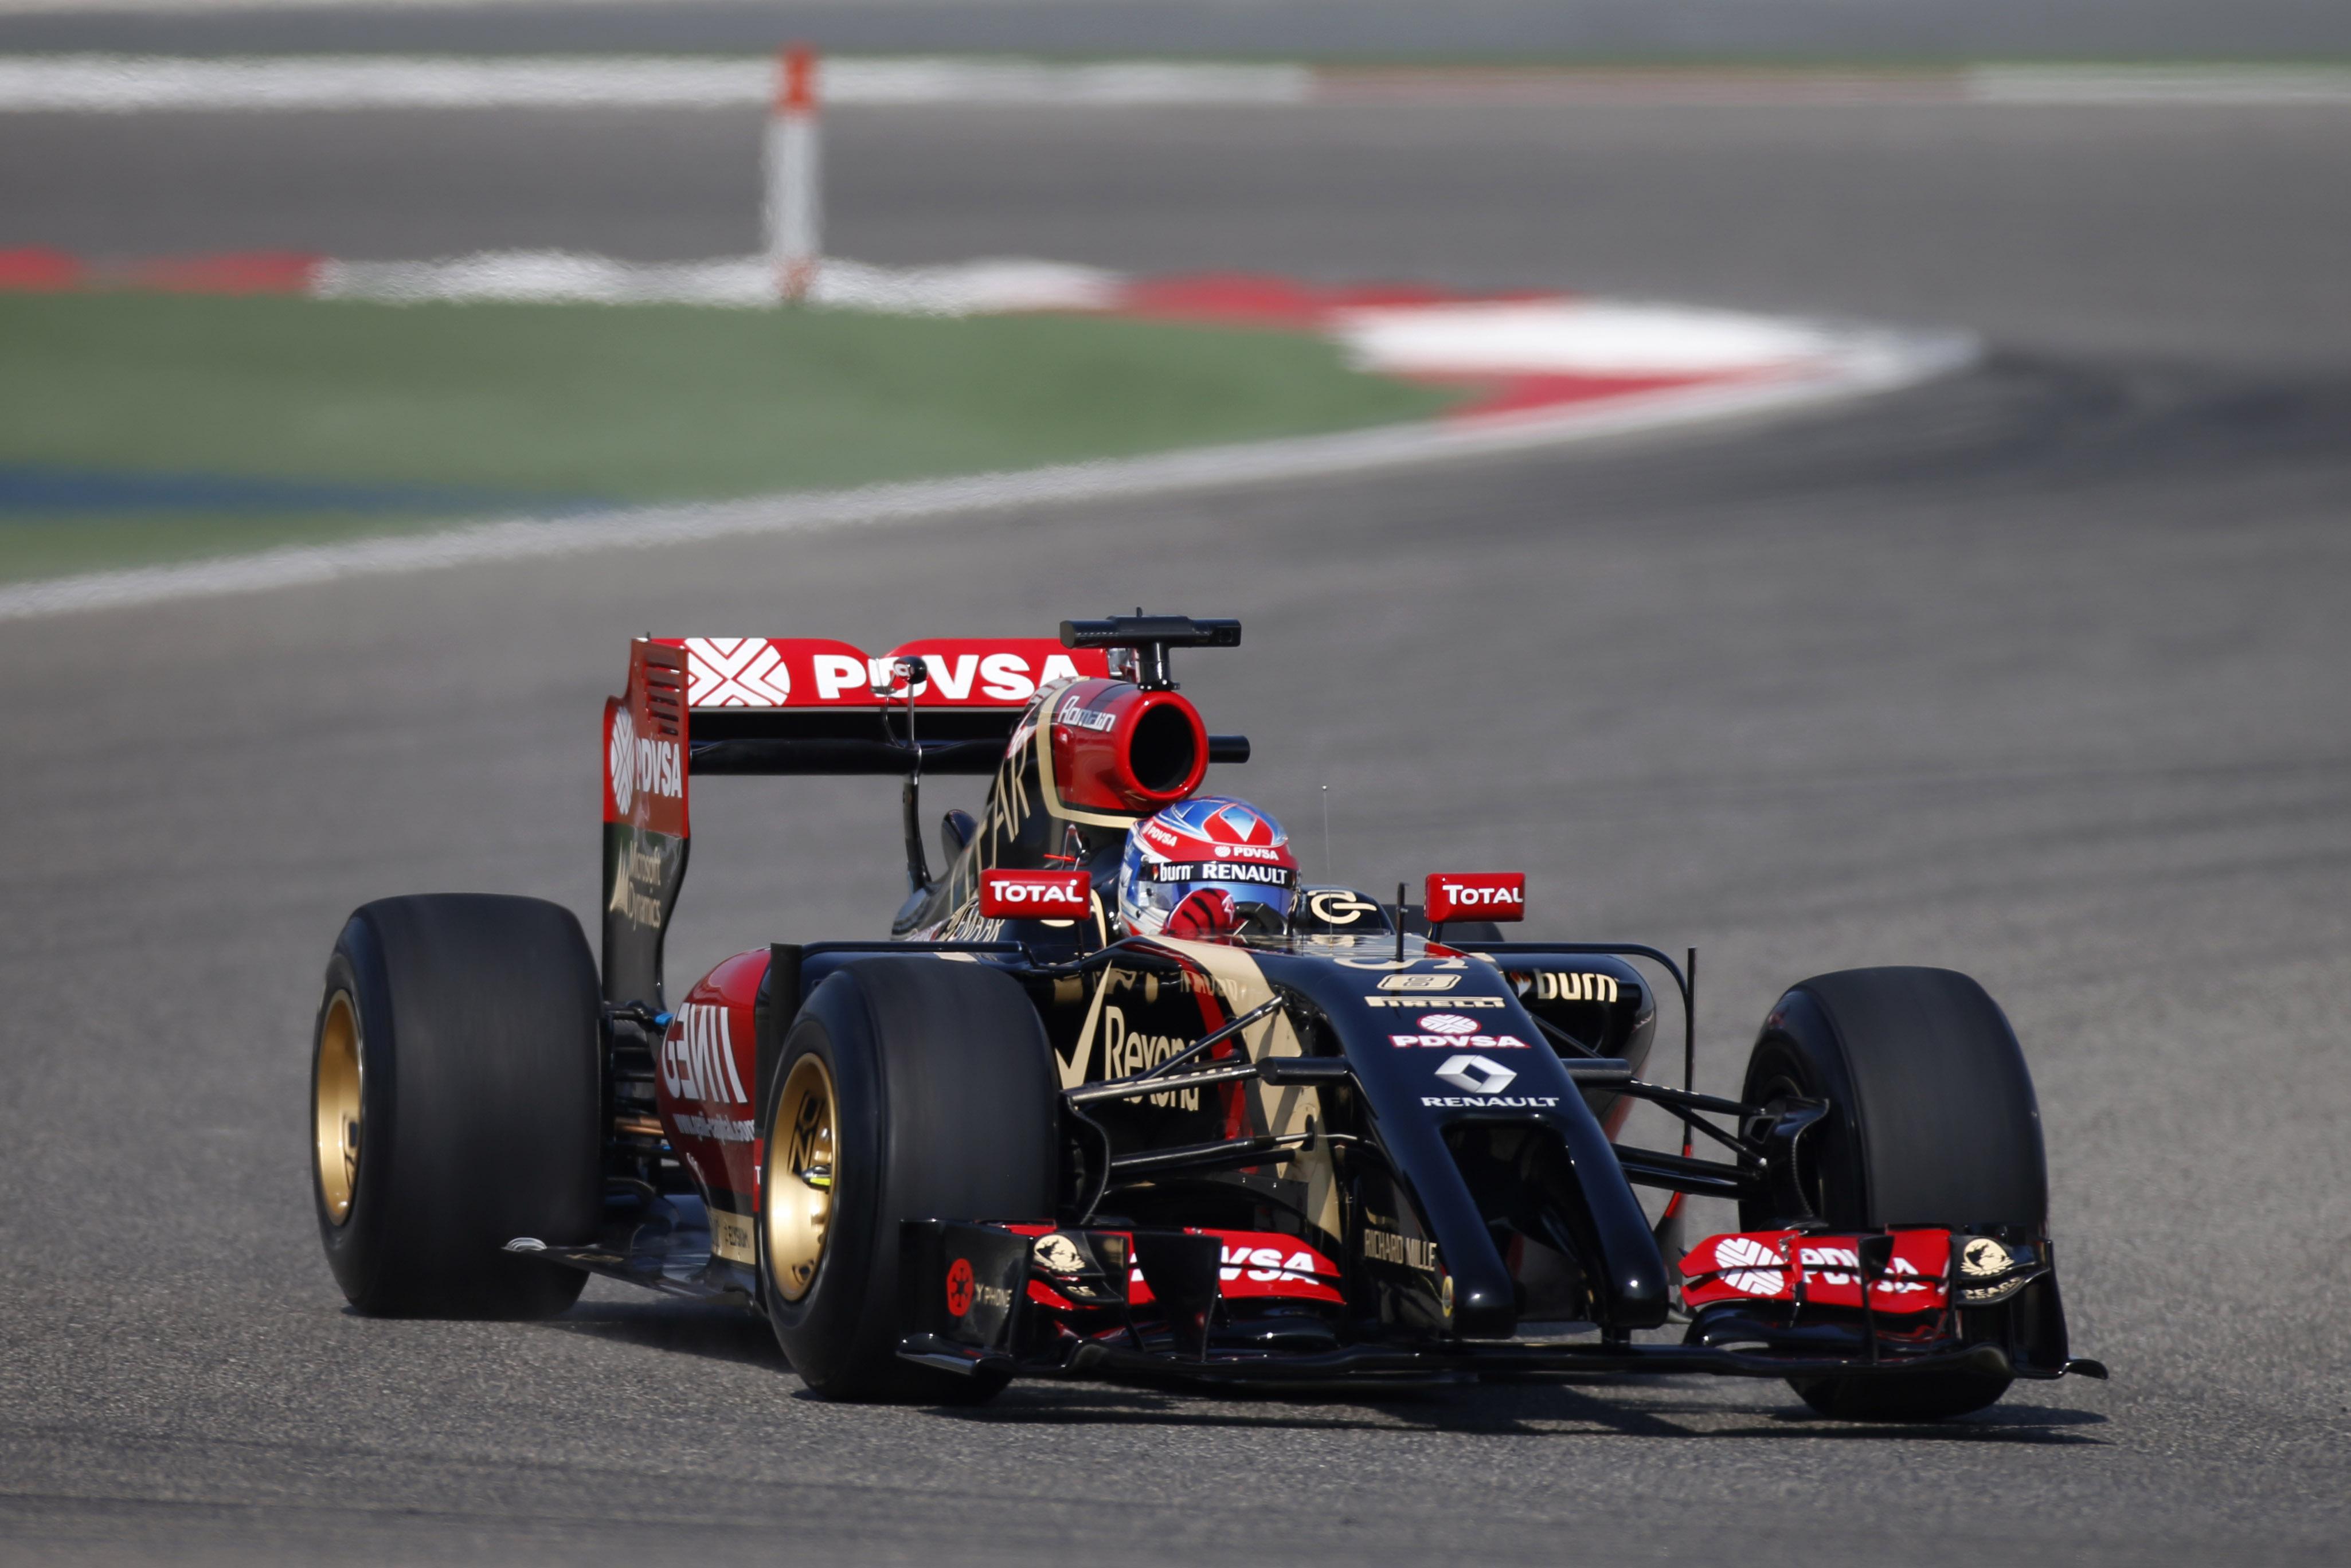 Lotus F1 Team e Renault Sport F1: l'amore continua